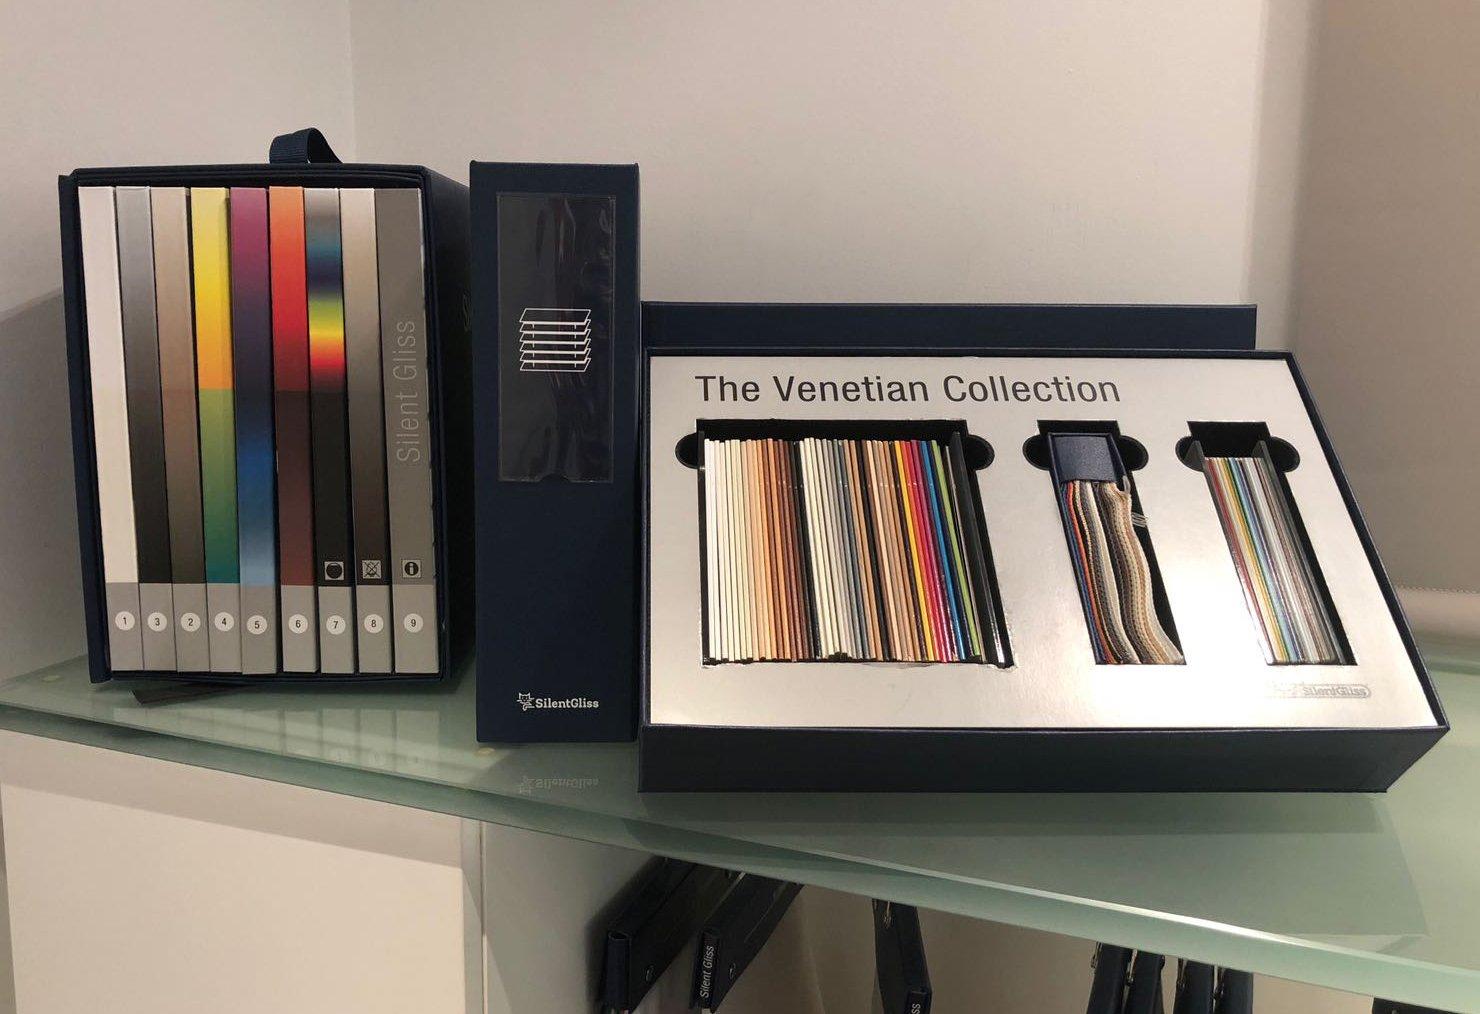 Silent Gliss Business Centre London - Venetian Collection